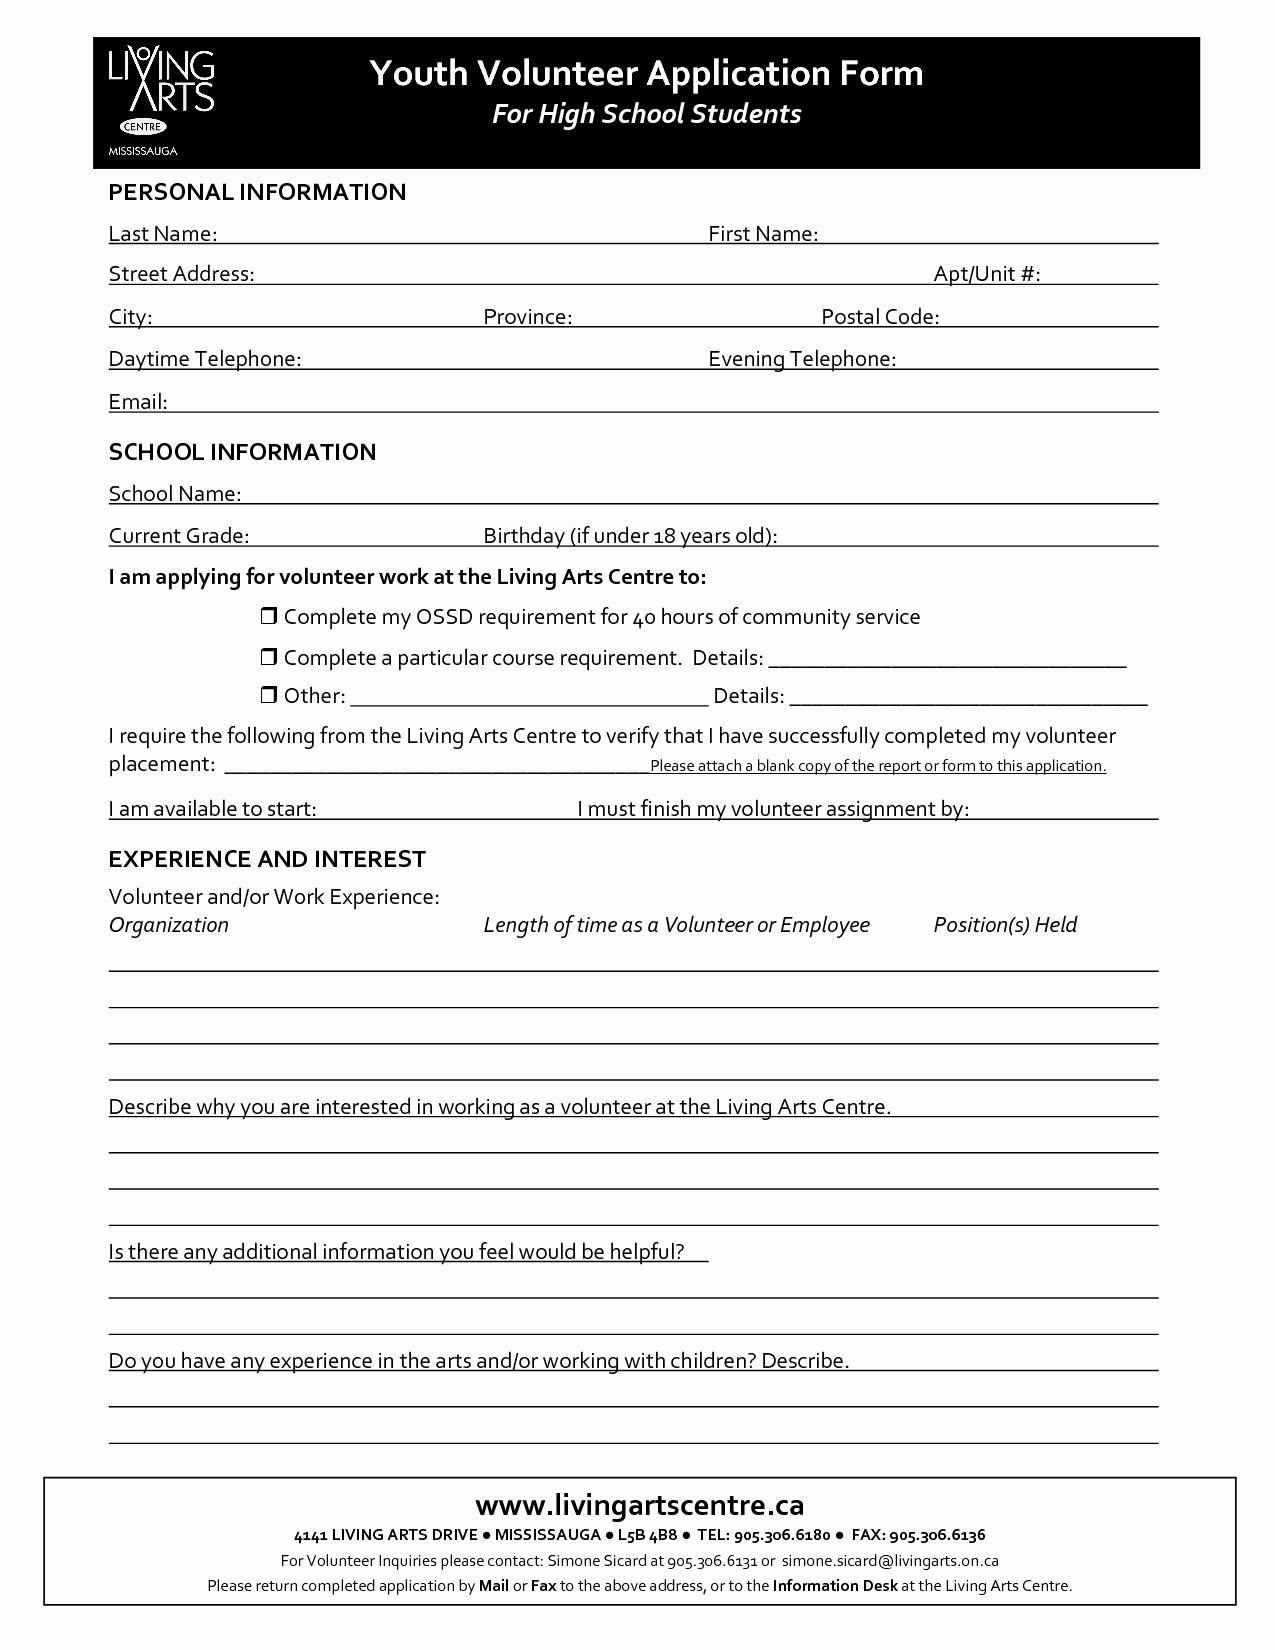 Volunteer Application Form Template Free Fresh Volunteer Application Form Printable To Pin On Volunteer Application Application Form Volunteer Hours Sample volunteer application form template